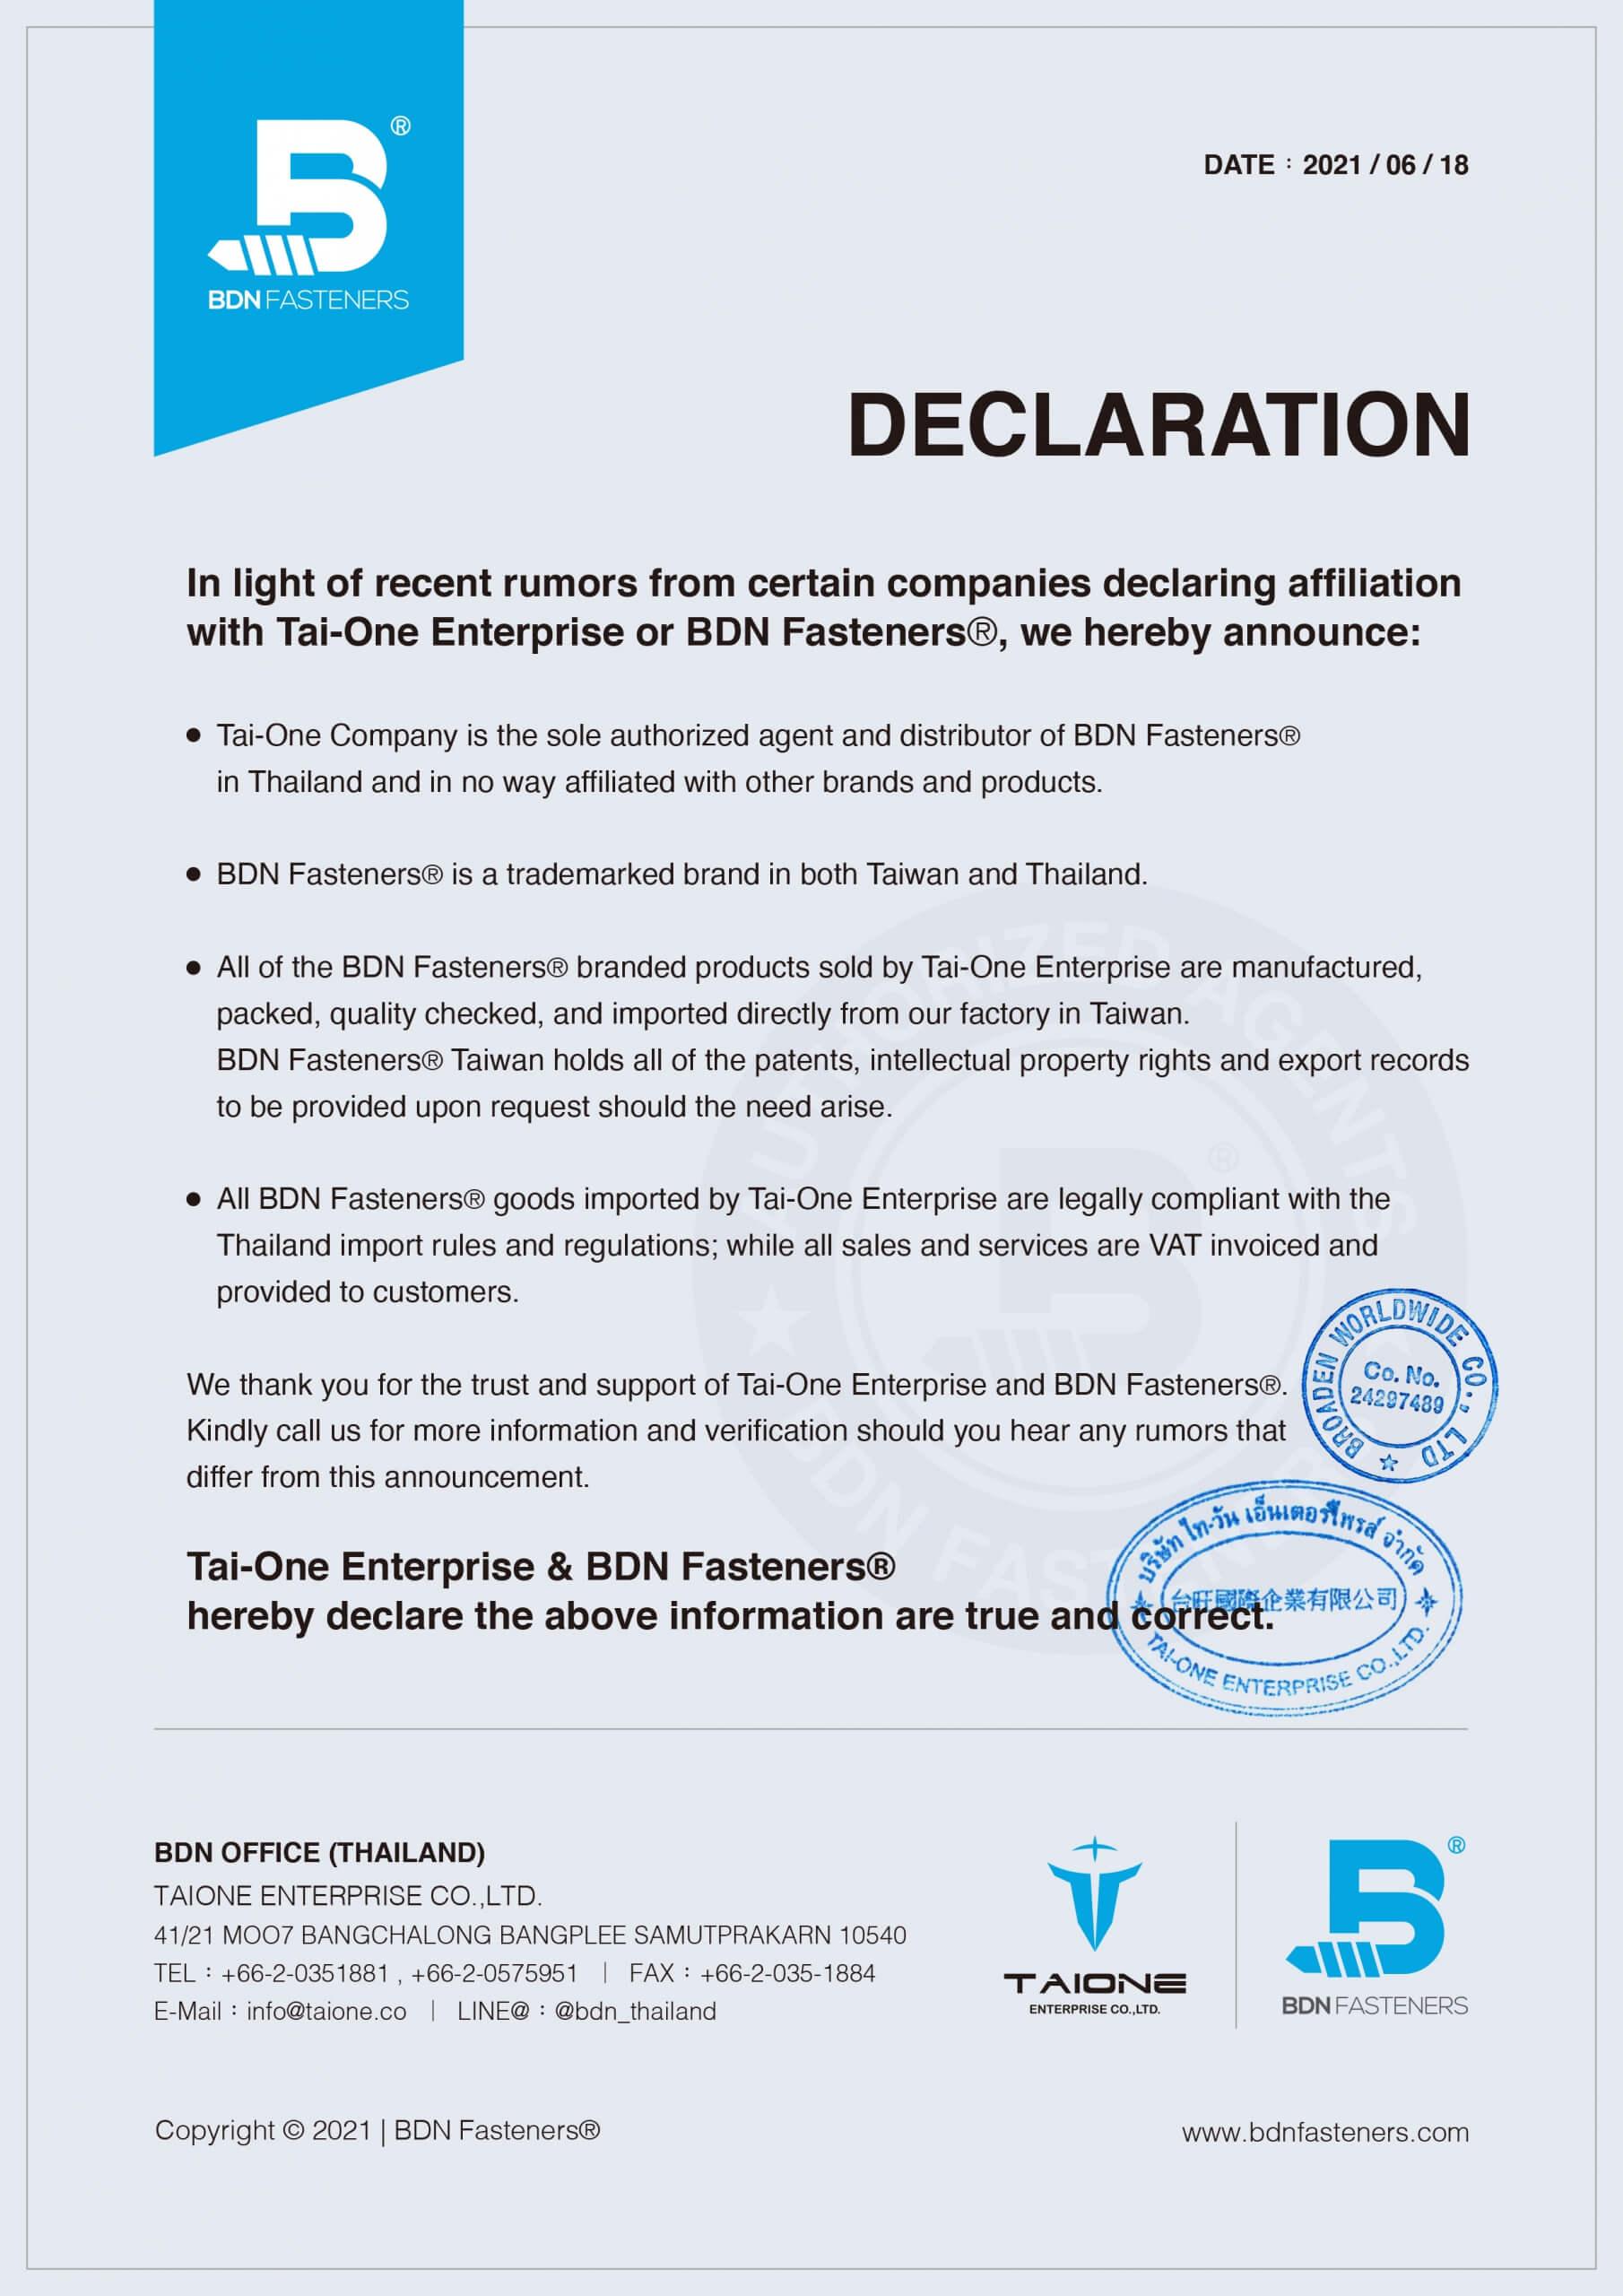 Tai-One Enterprise & BDN Fasteners® hereby declare